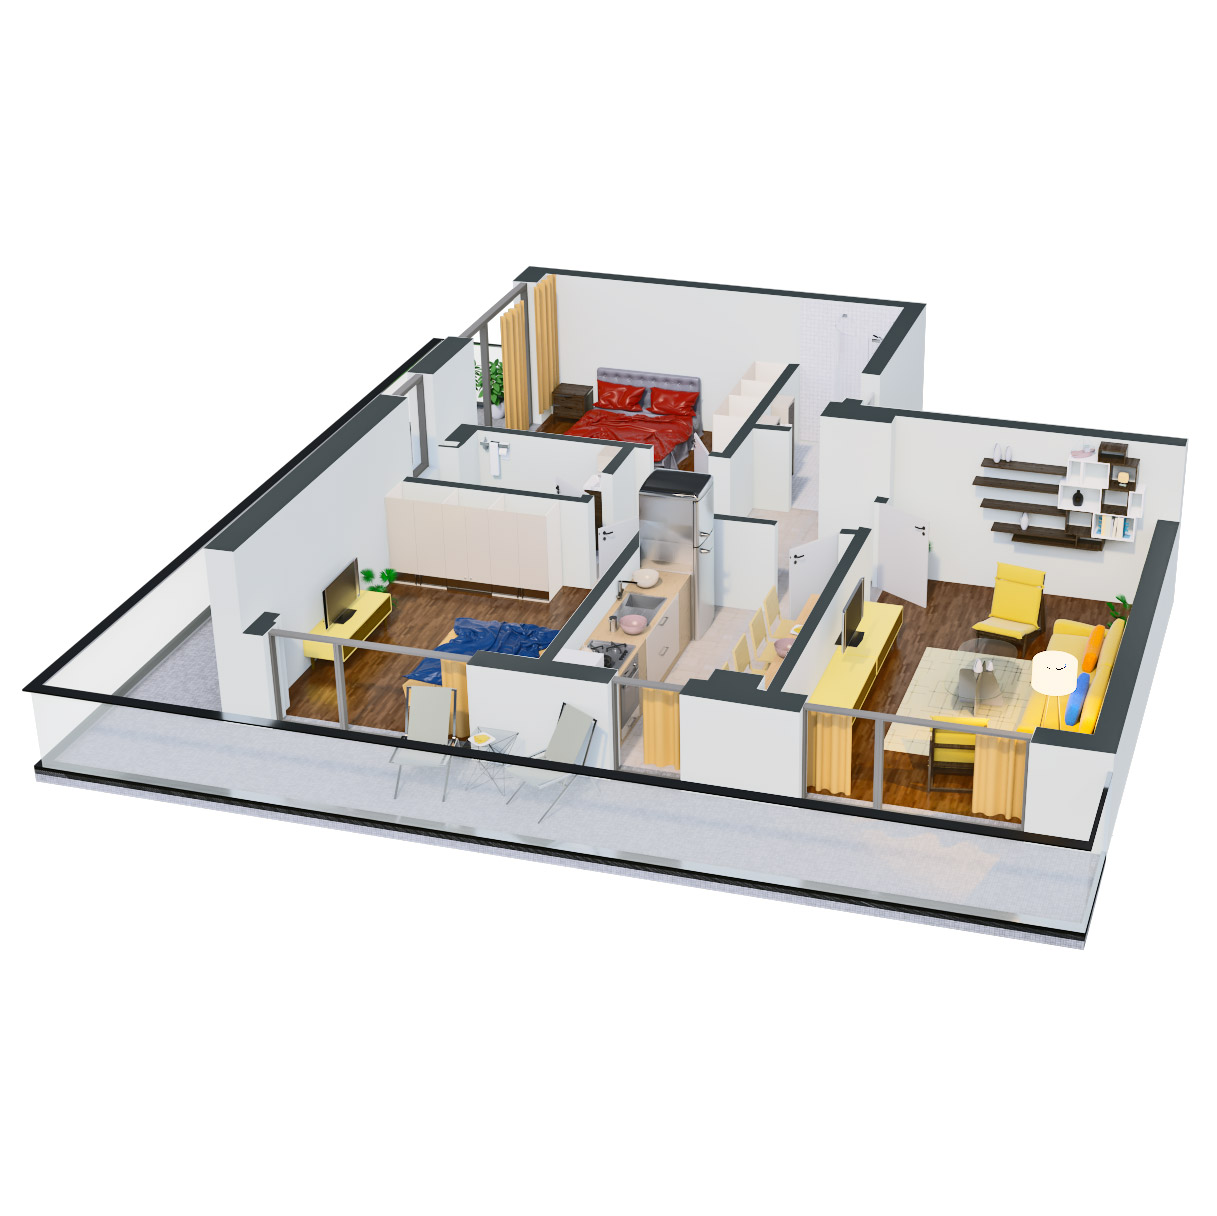 Apartament 3 camere de vanzare Bucuresti - Catedral Residence - Marriott, Piata Unirii, 13 Septembrie, Izvor - Tip 6 - T2 - D